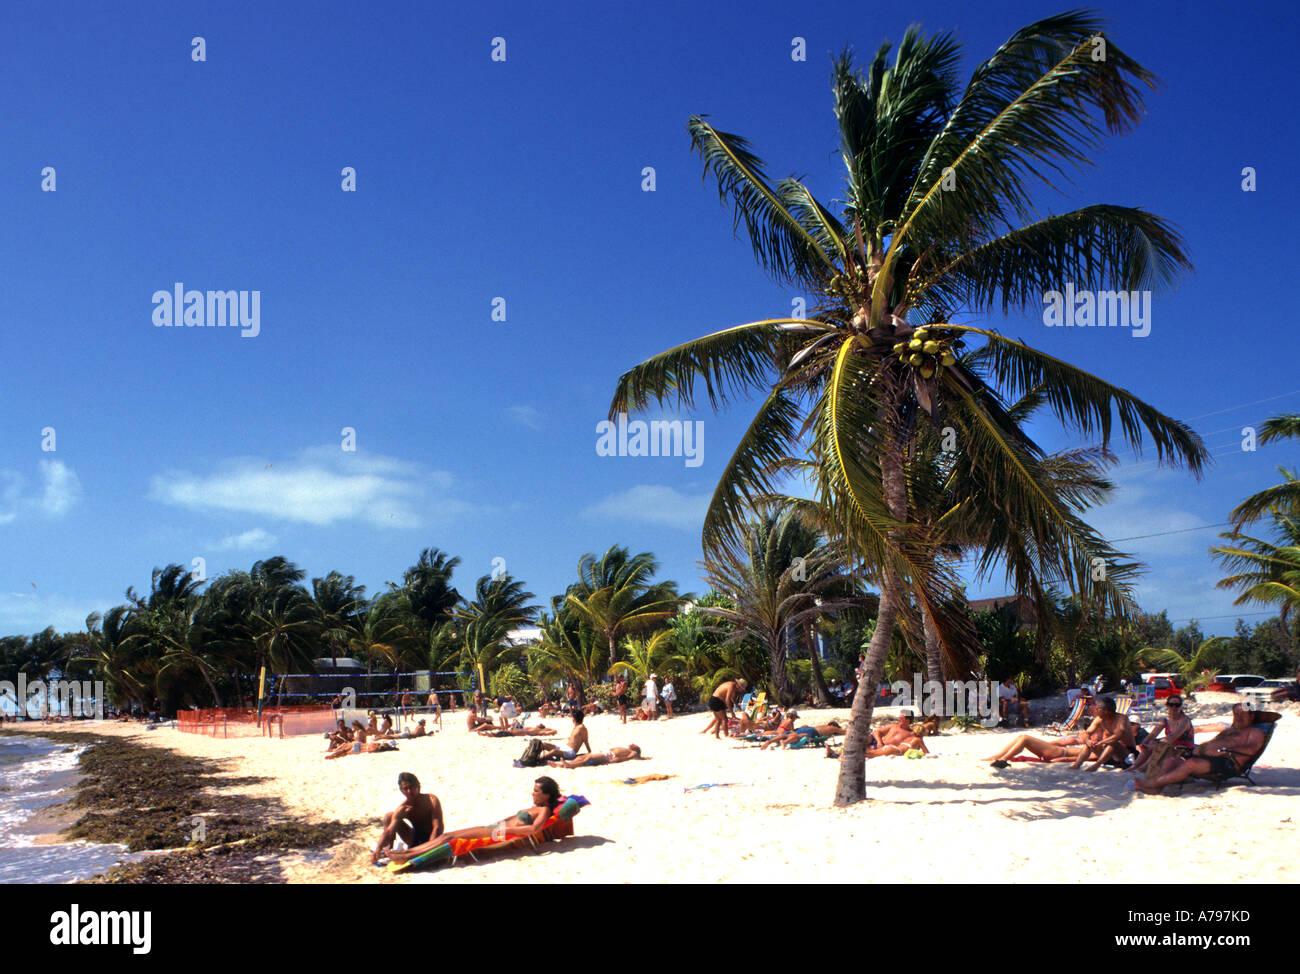 florida beach with palm trees. key west florida beach sea palm tree trees people with a